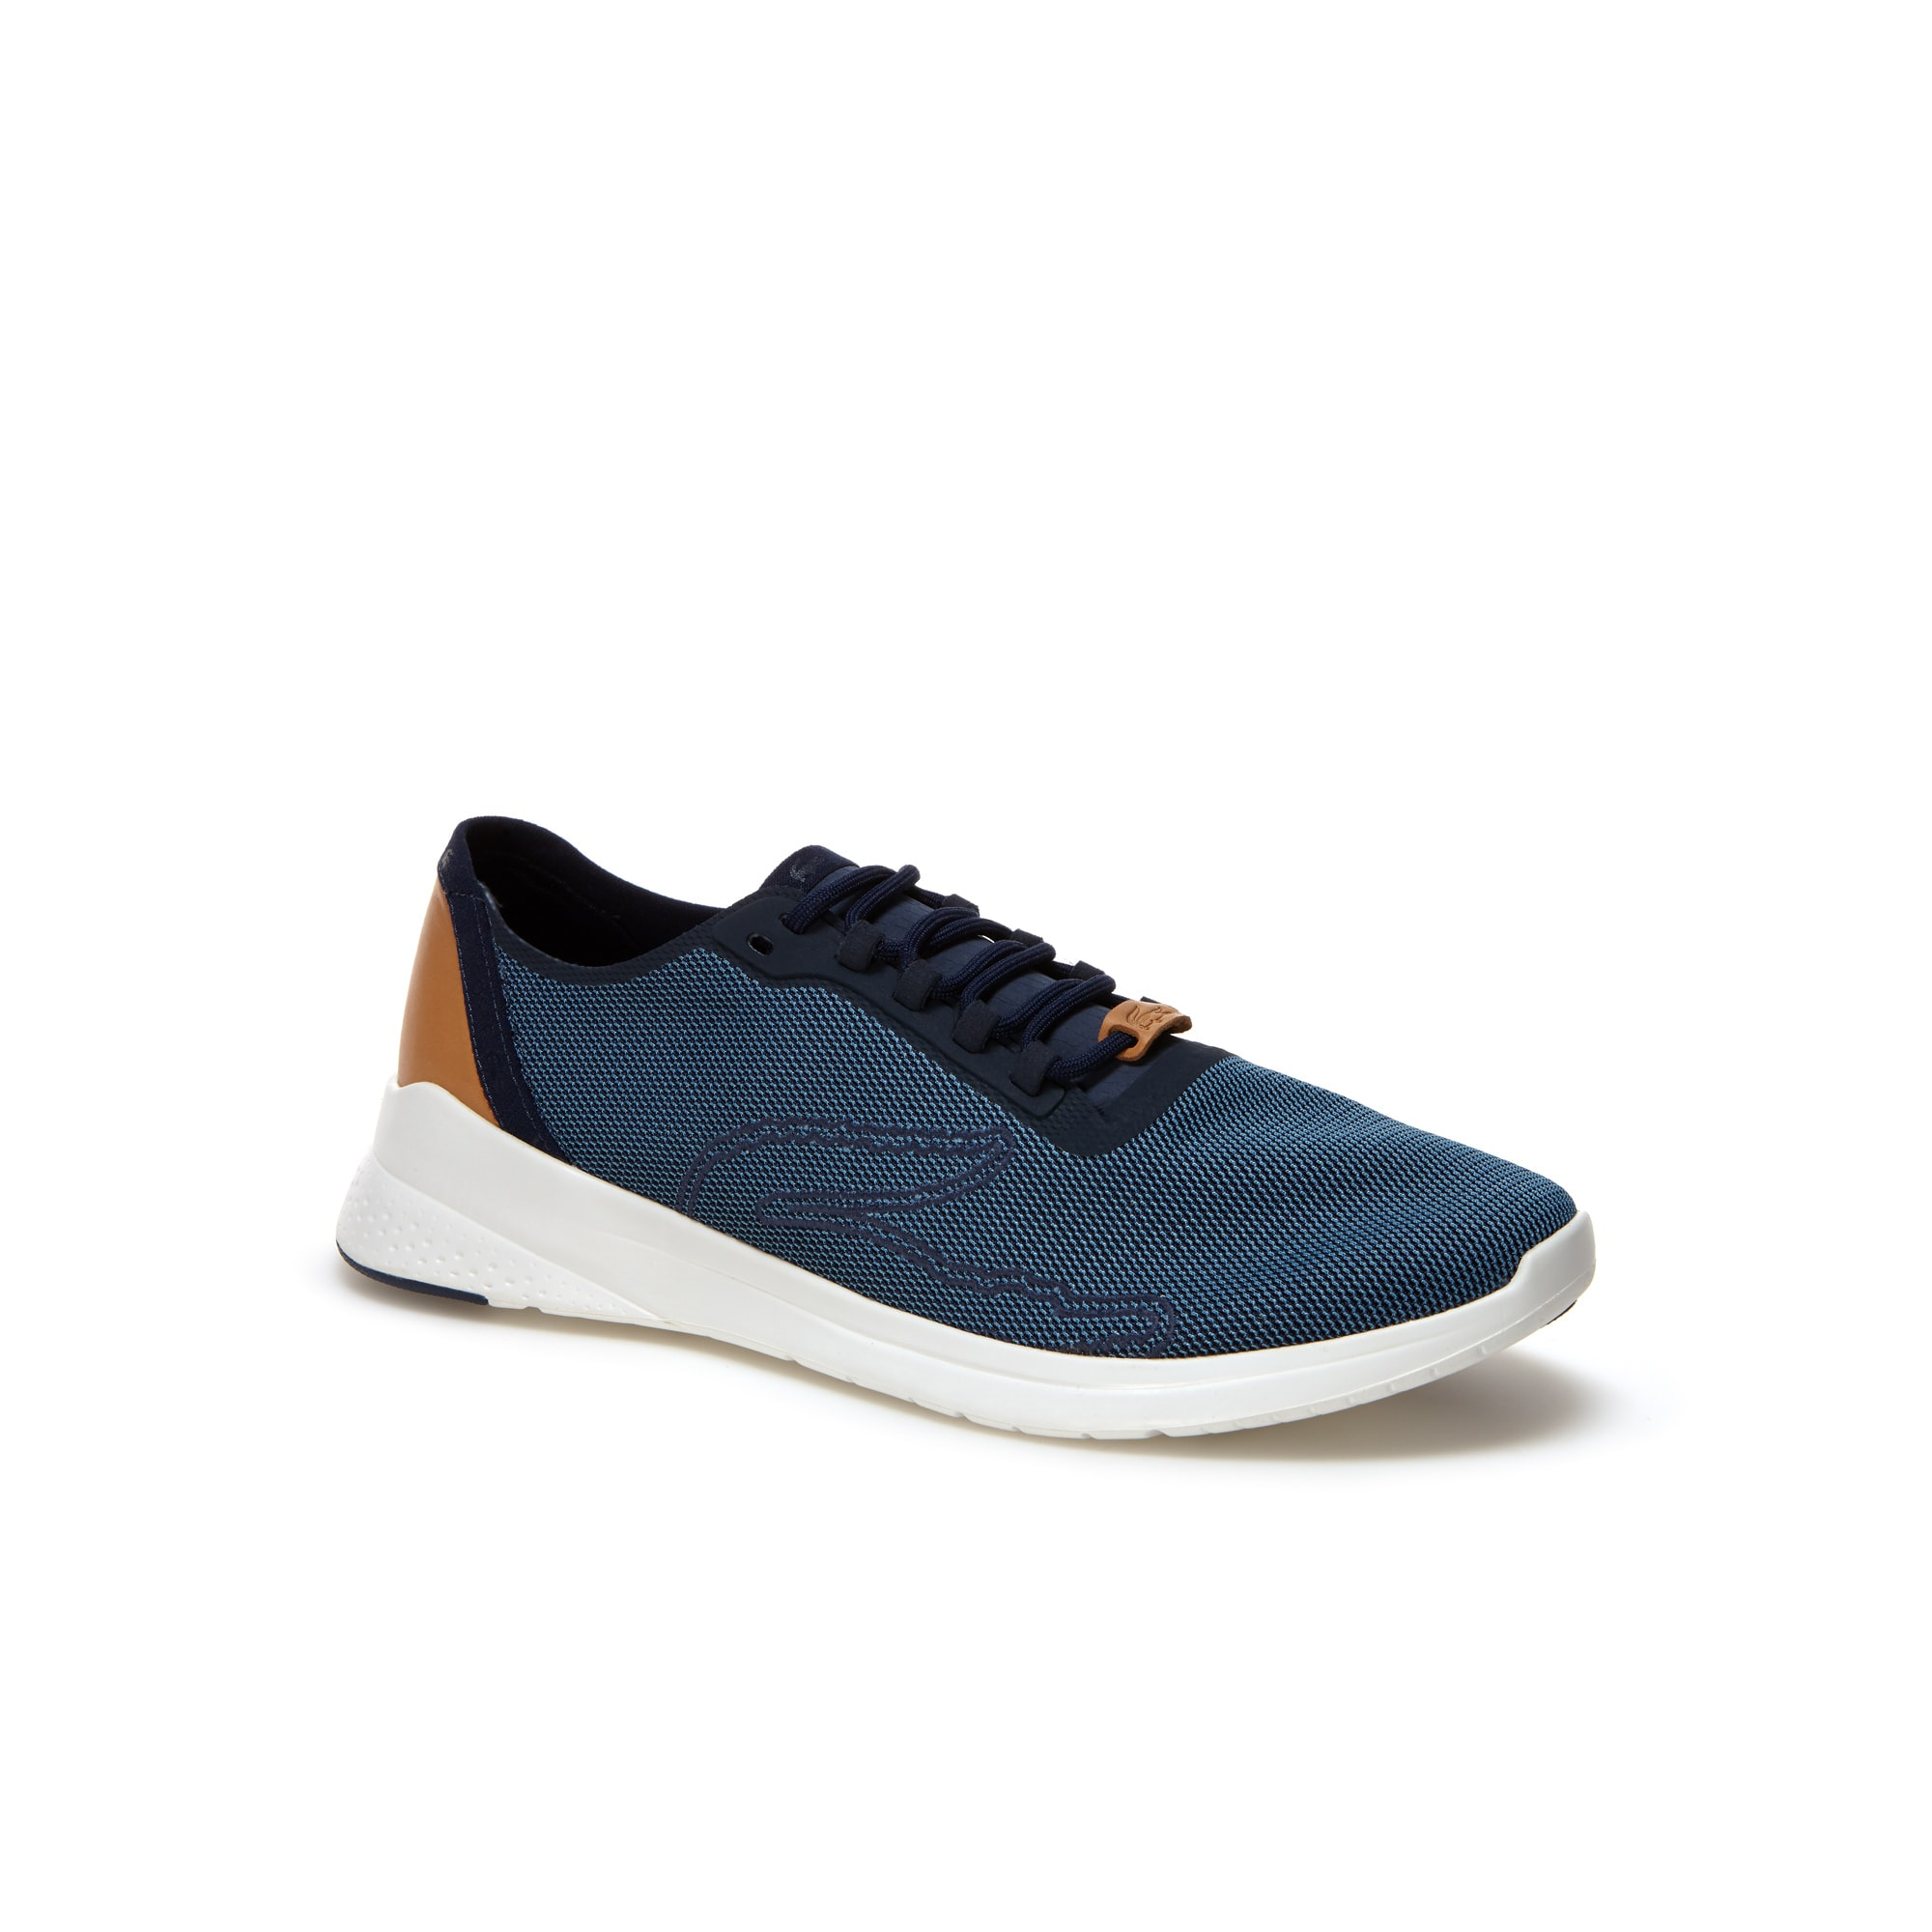 Sneakers LT Fit en textile